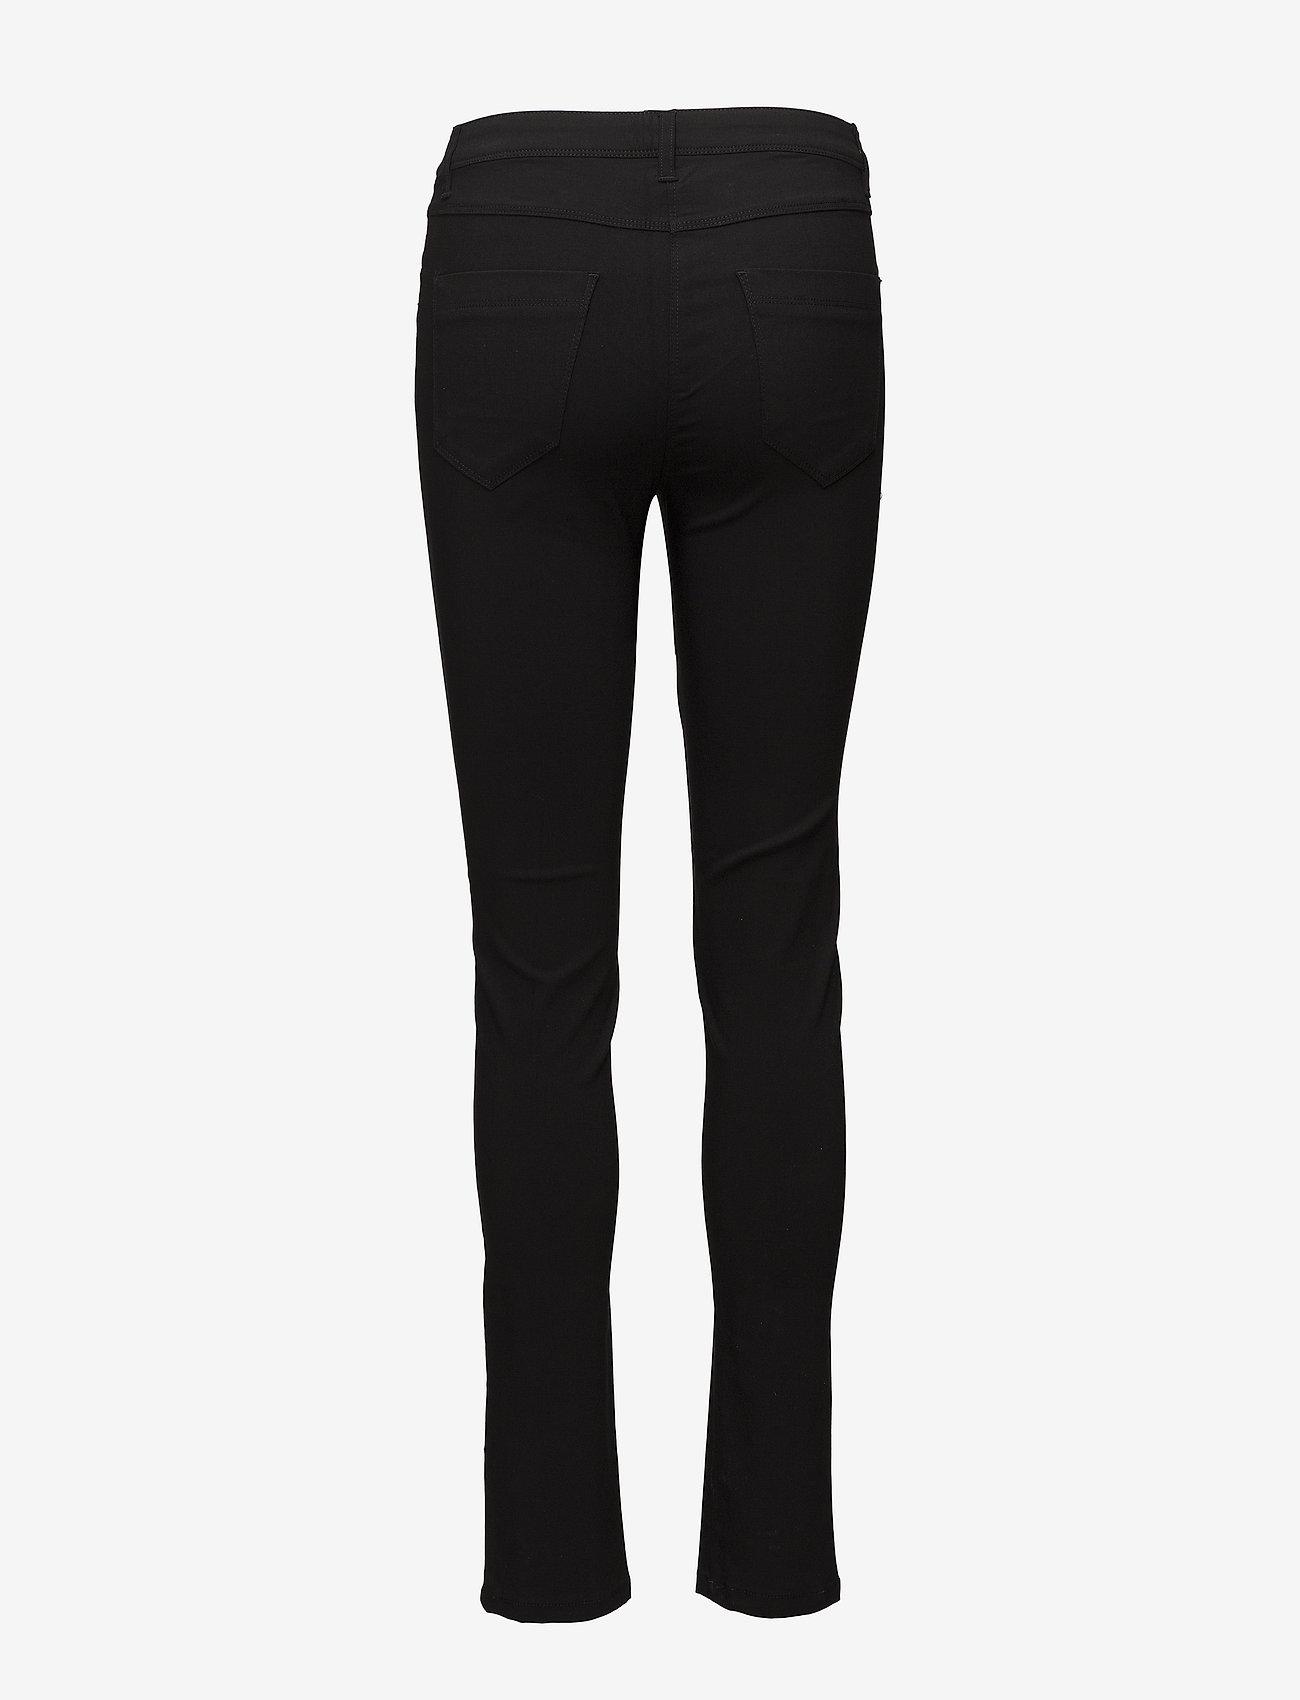 Soyaconcept - SC-LILLY - slim jeans - black - 1